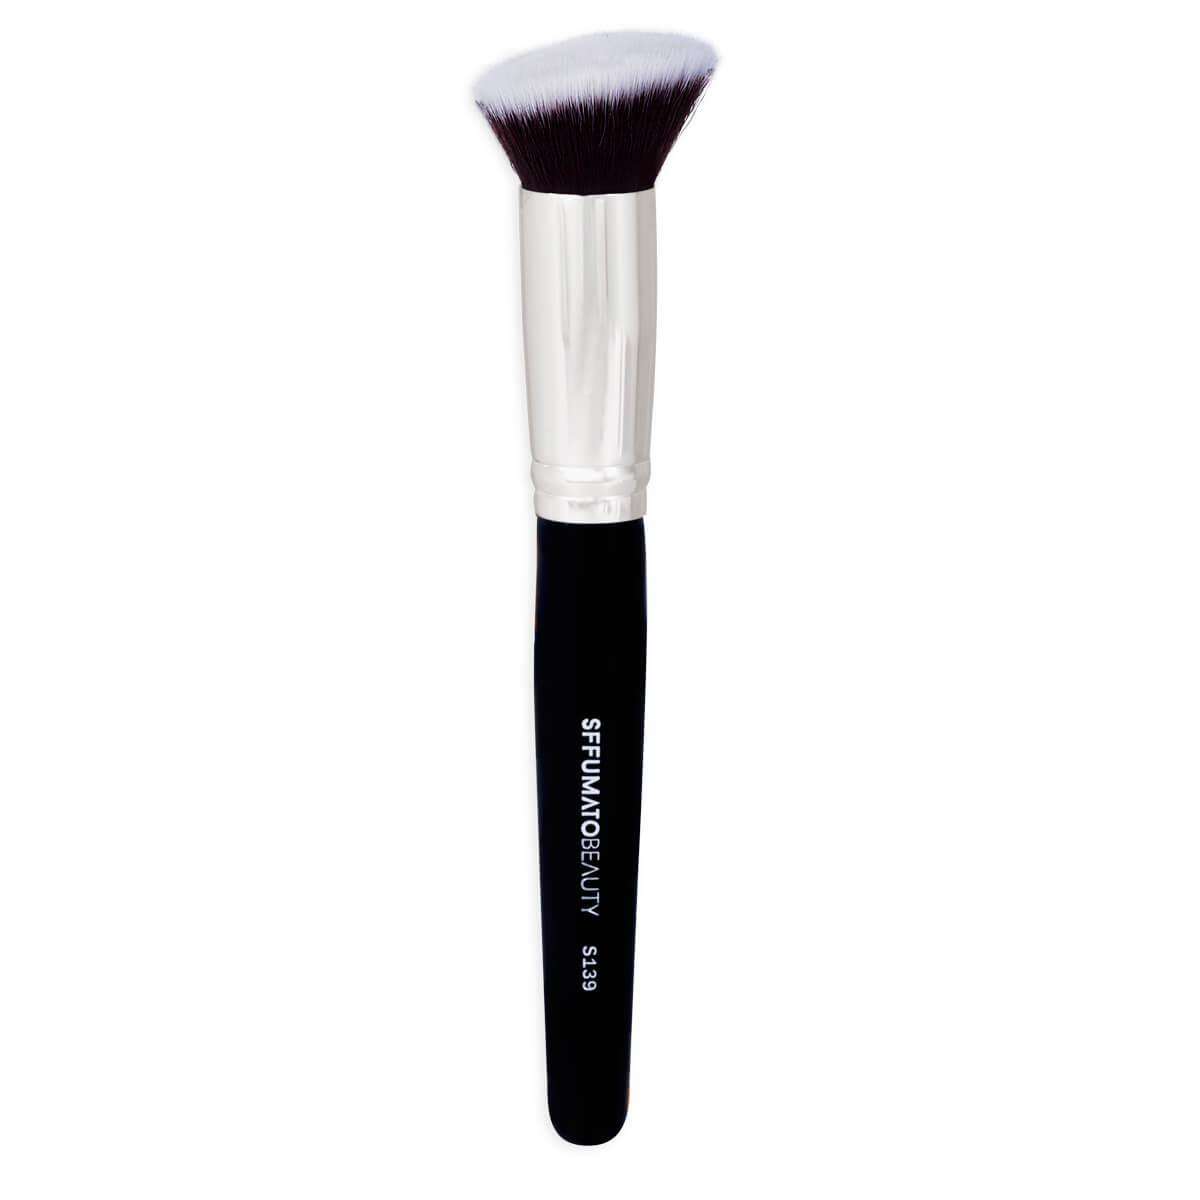 S139 - Pincel Kabuki Angular Profissional Sffumato Beauty